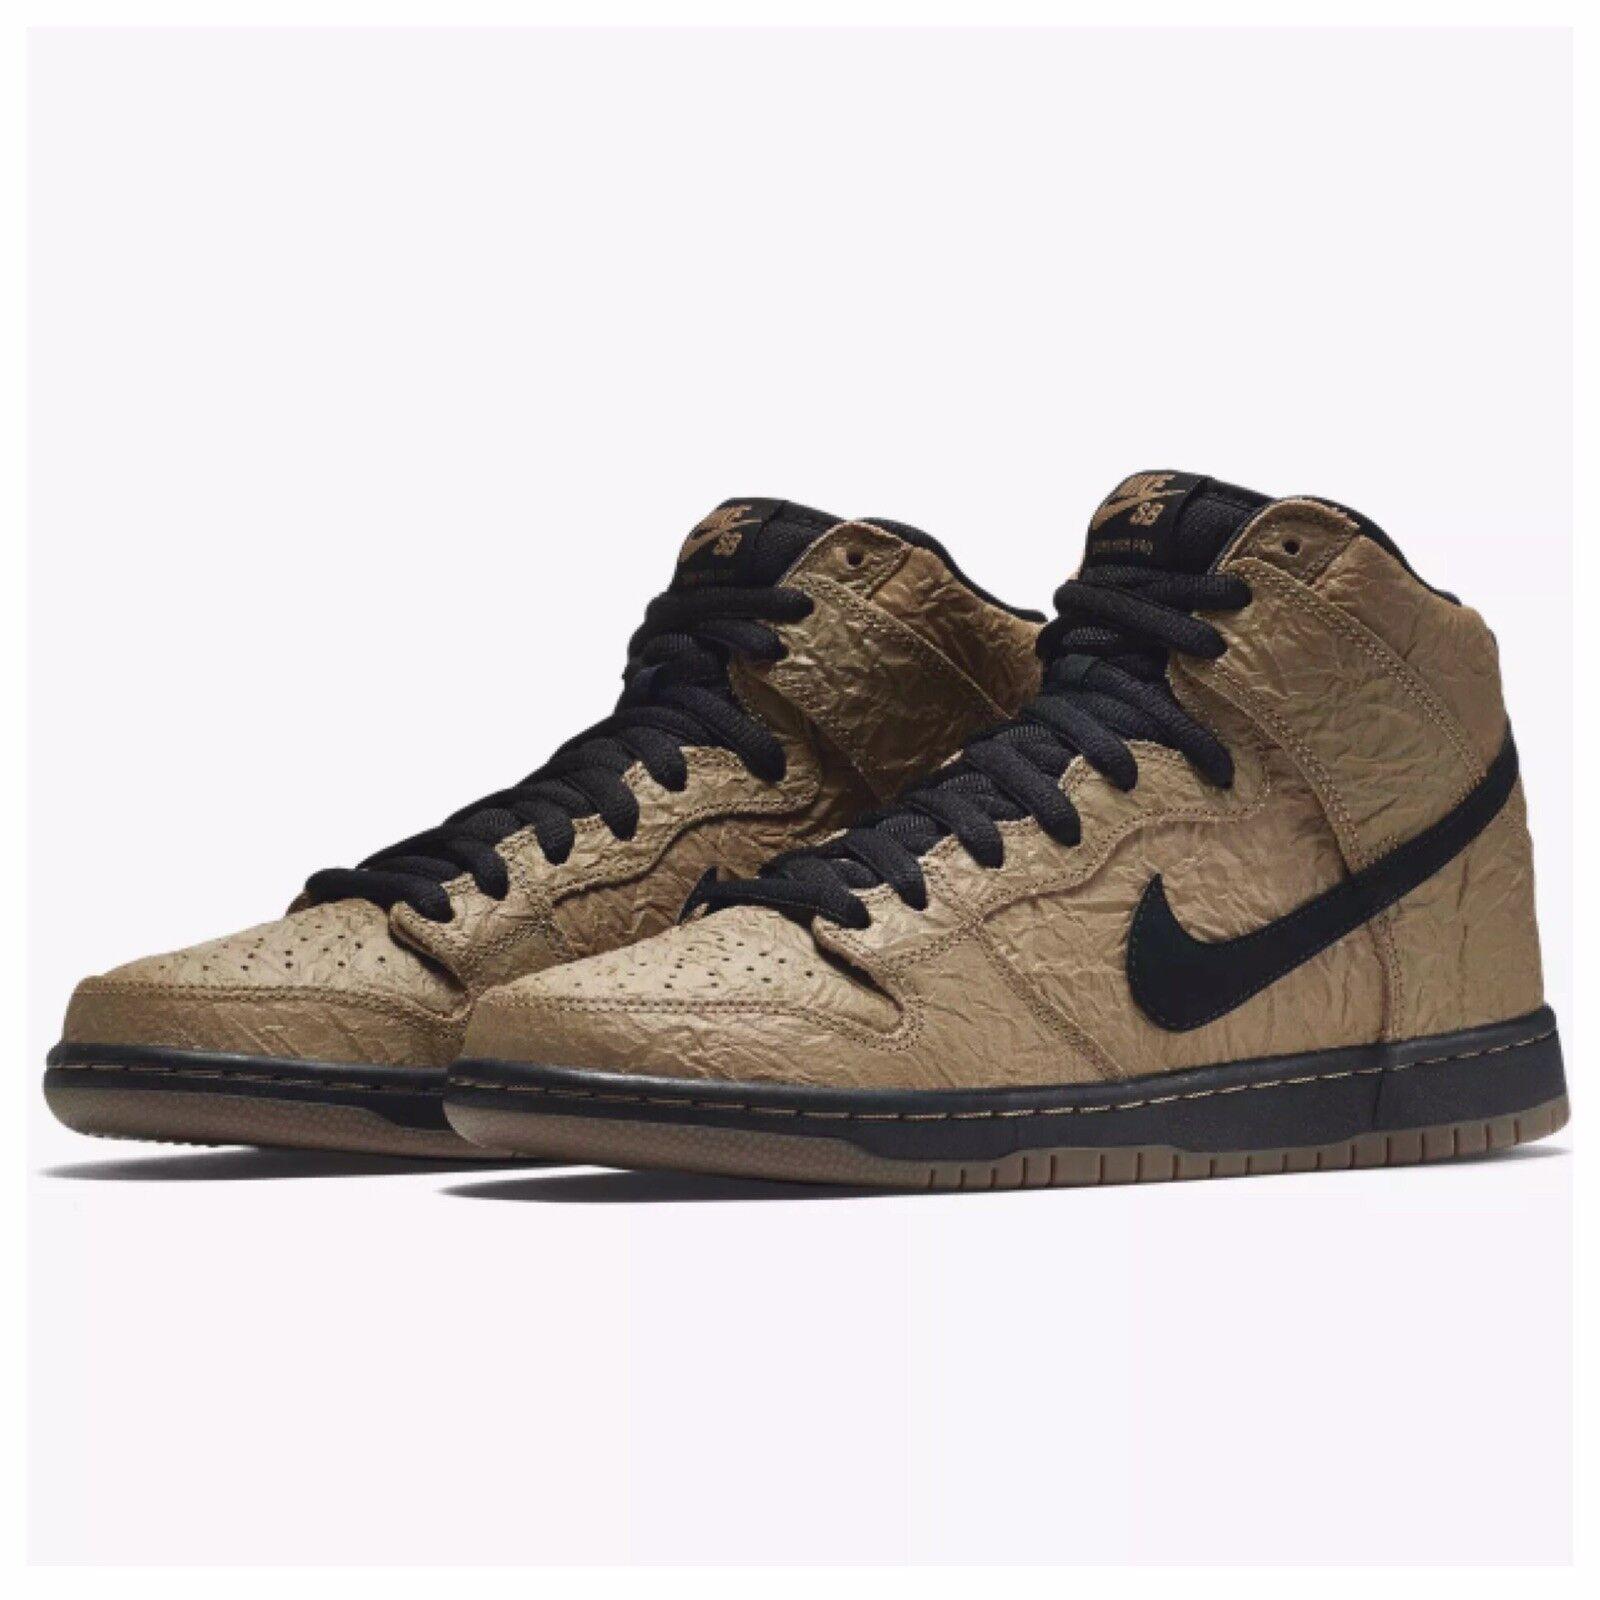 New Nike Dunk High Premium SB Filbert Brown Paper Bag 313171-202 Size 9 Migos